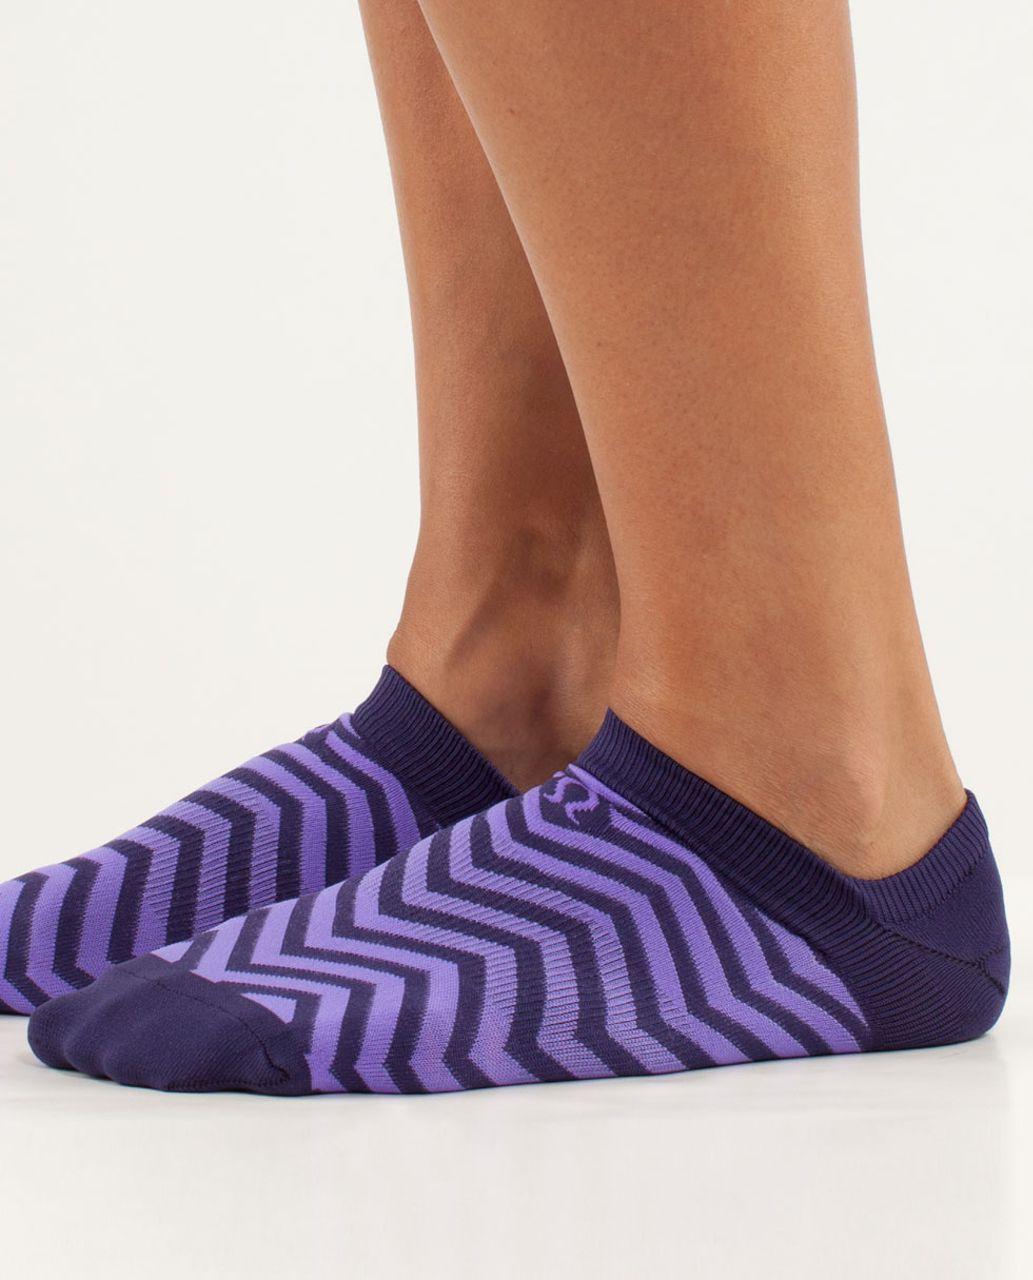 Lululemon Women's Featherweight Sock - Chevron Dense Purple / Power Purple